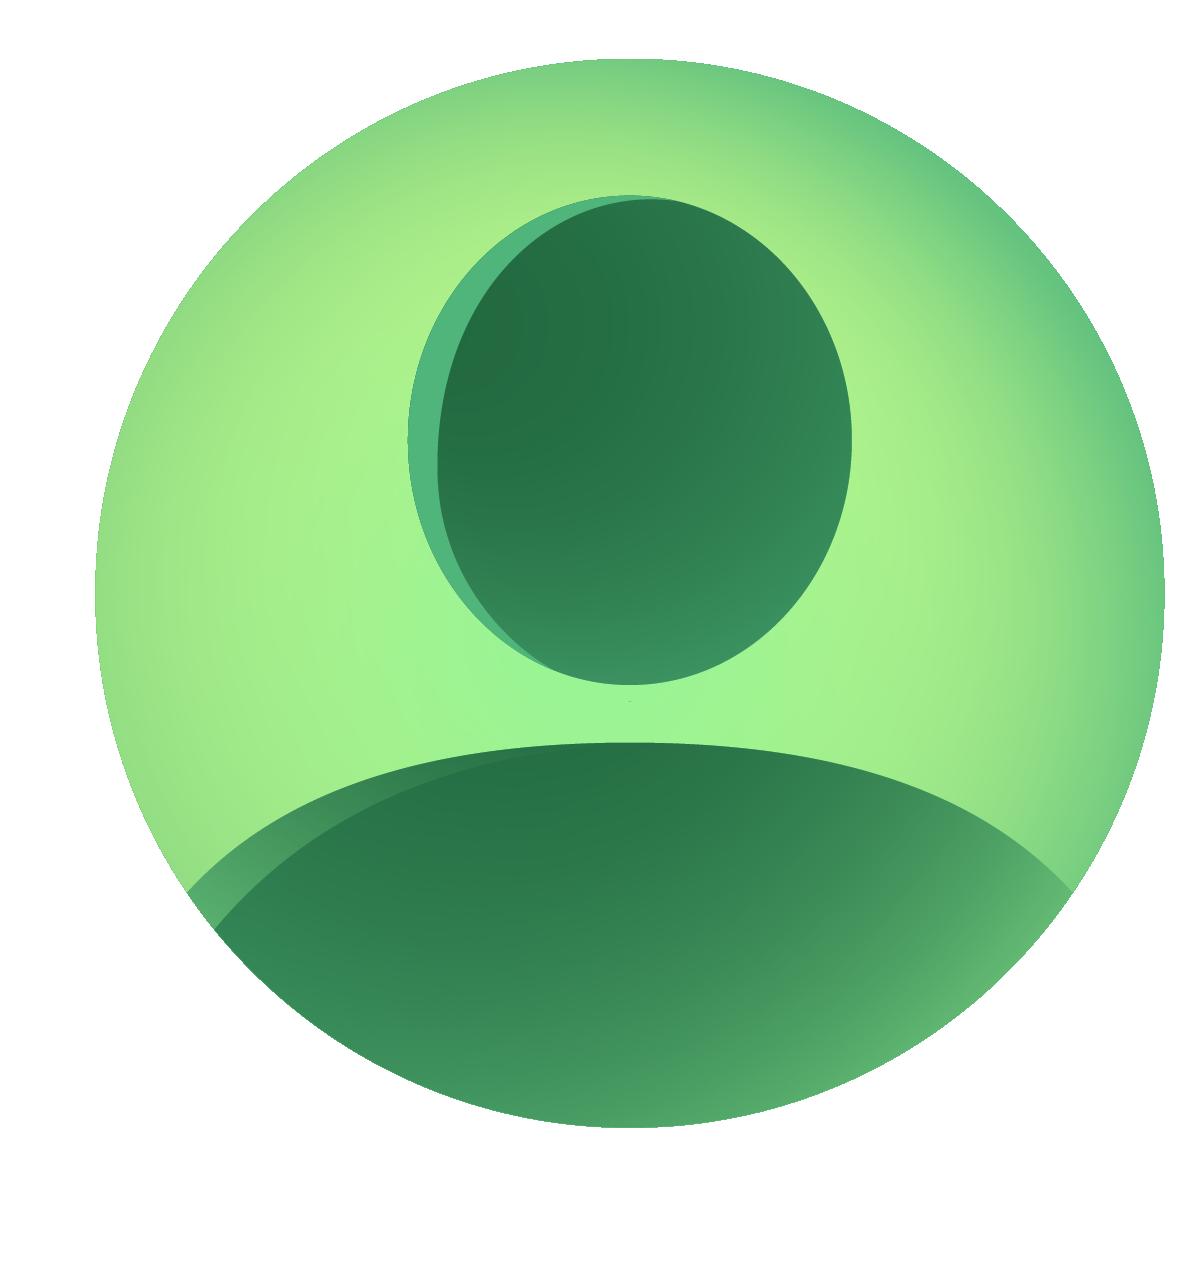 Generic Avatars Final V1_green.png